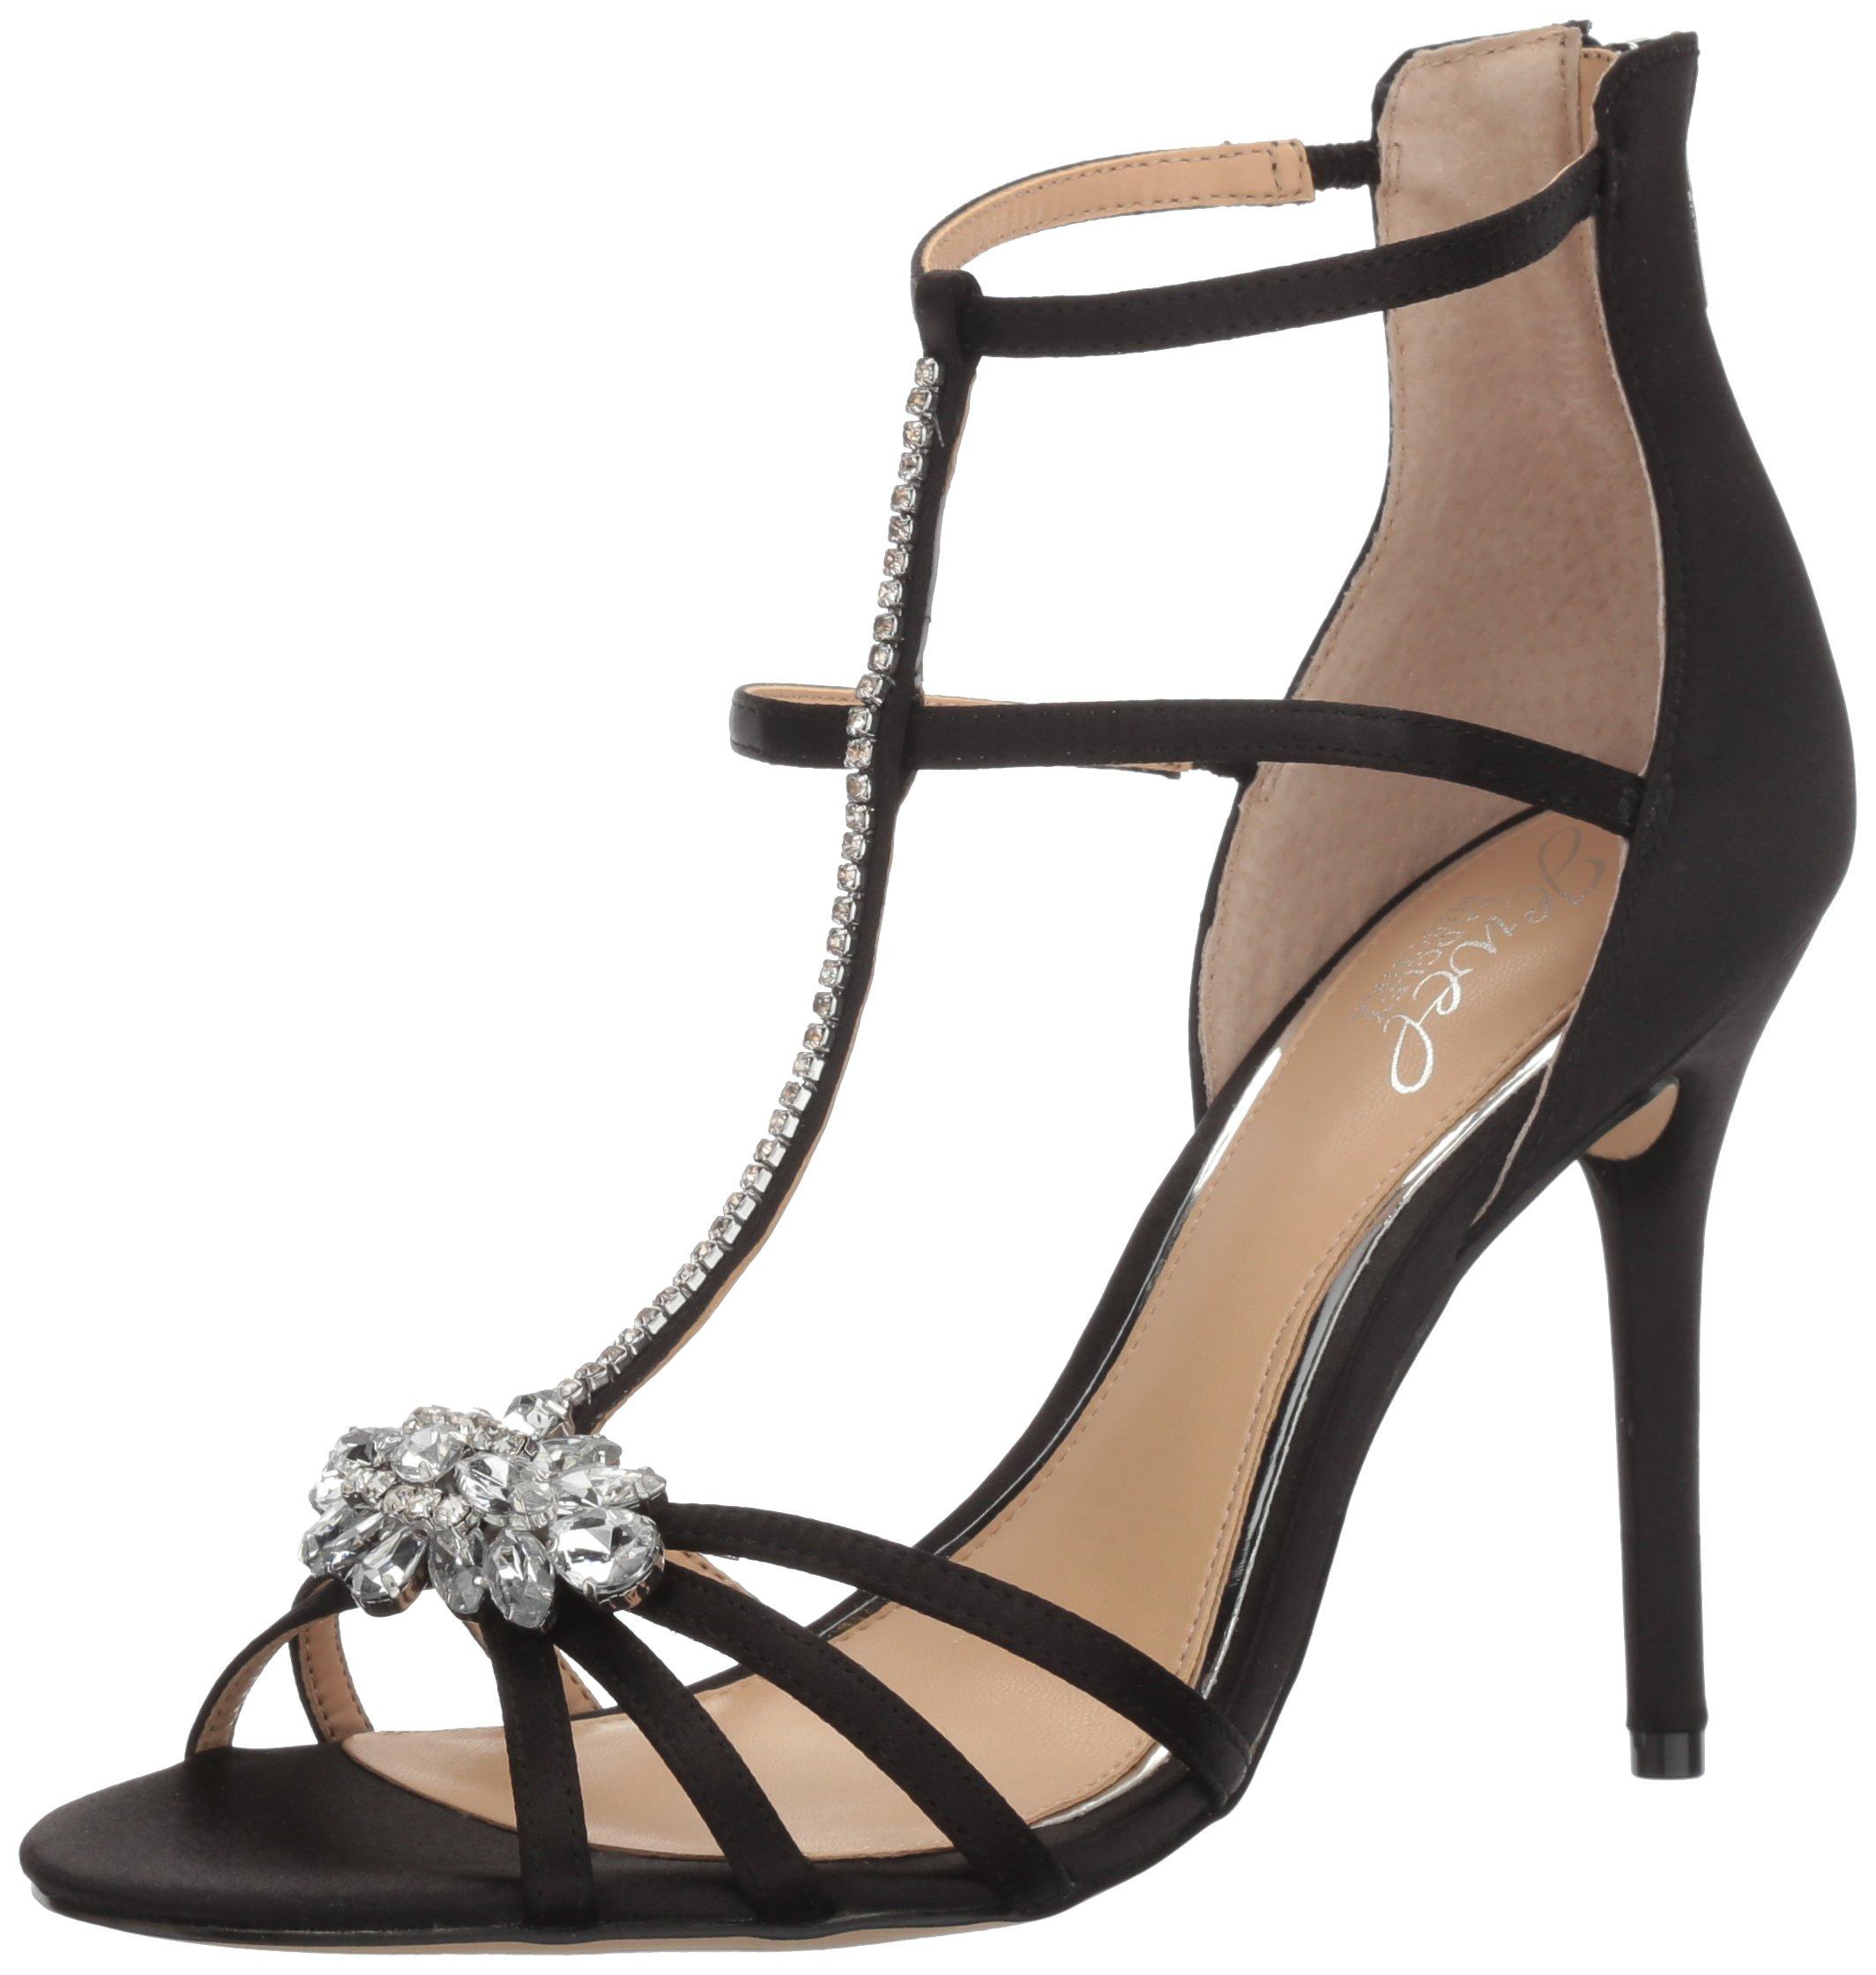 Jewel Badgley Mischka Women's Hazel Dress Sandal, Black, 7 M US